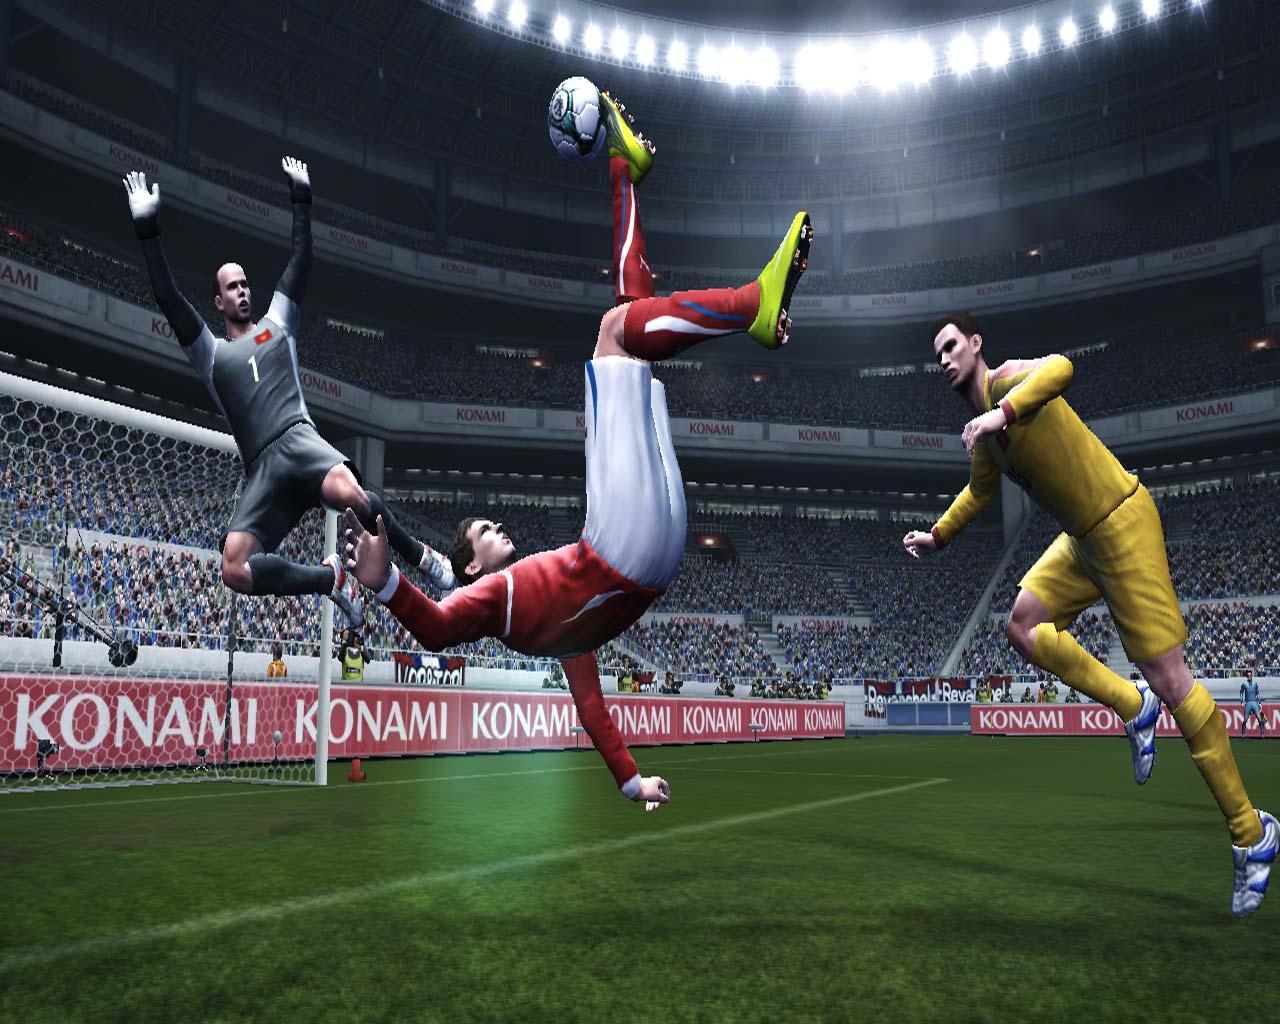 Pro Evolution Soccer 2011 - král je mrtev? 23550